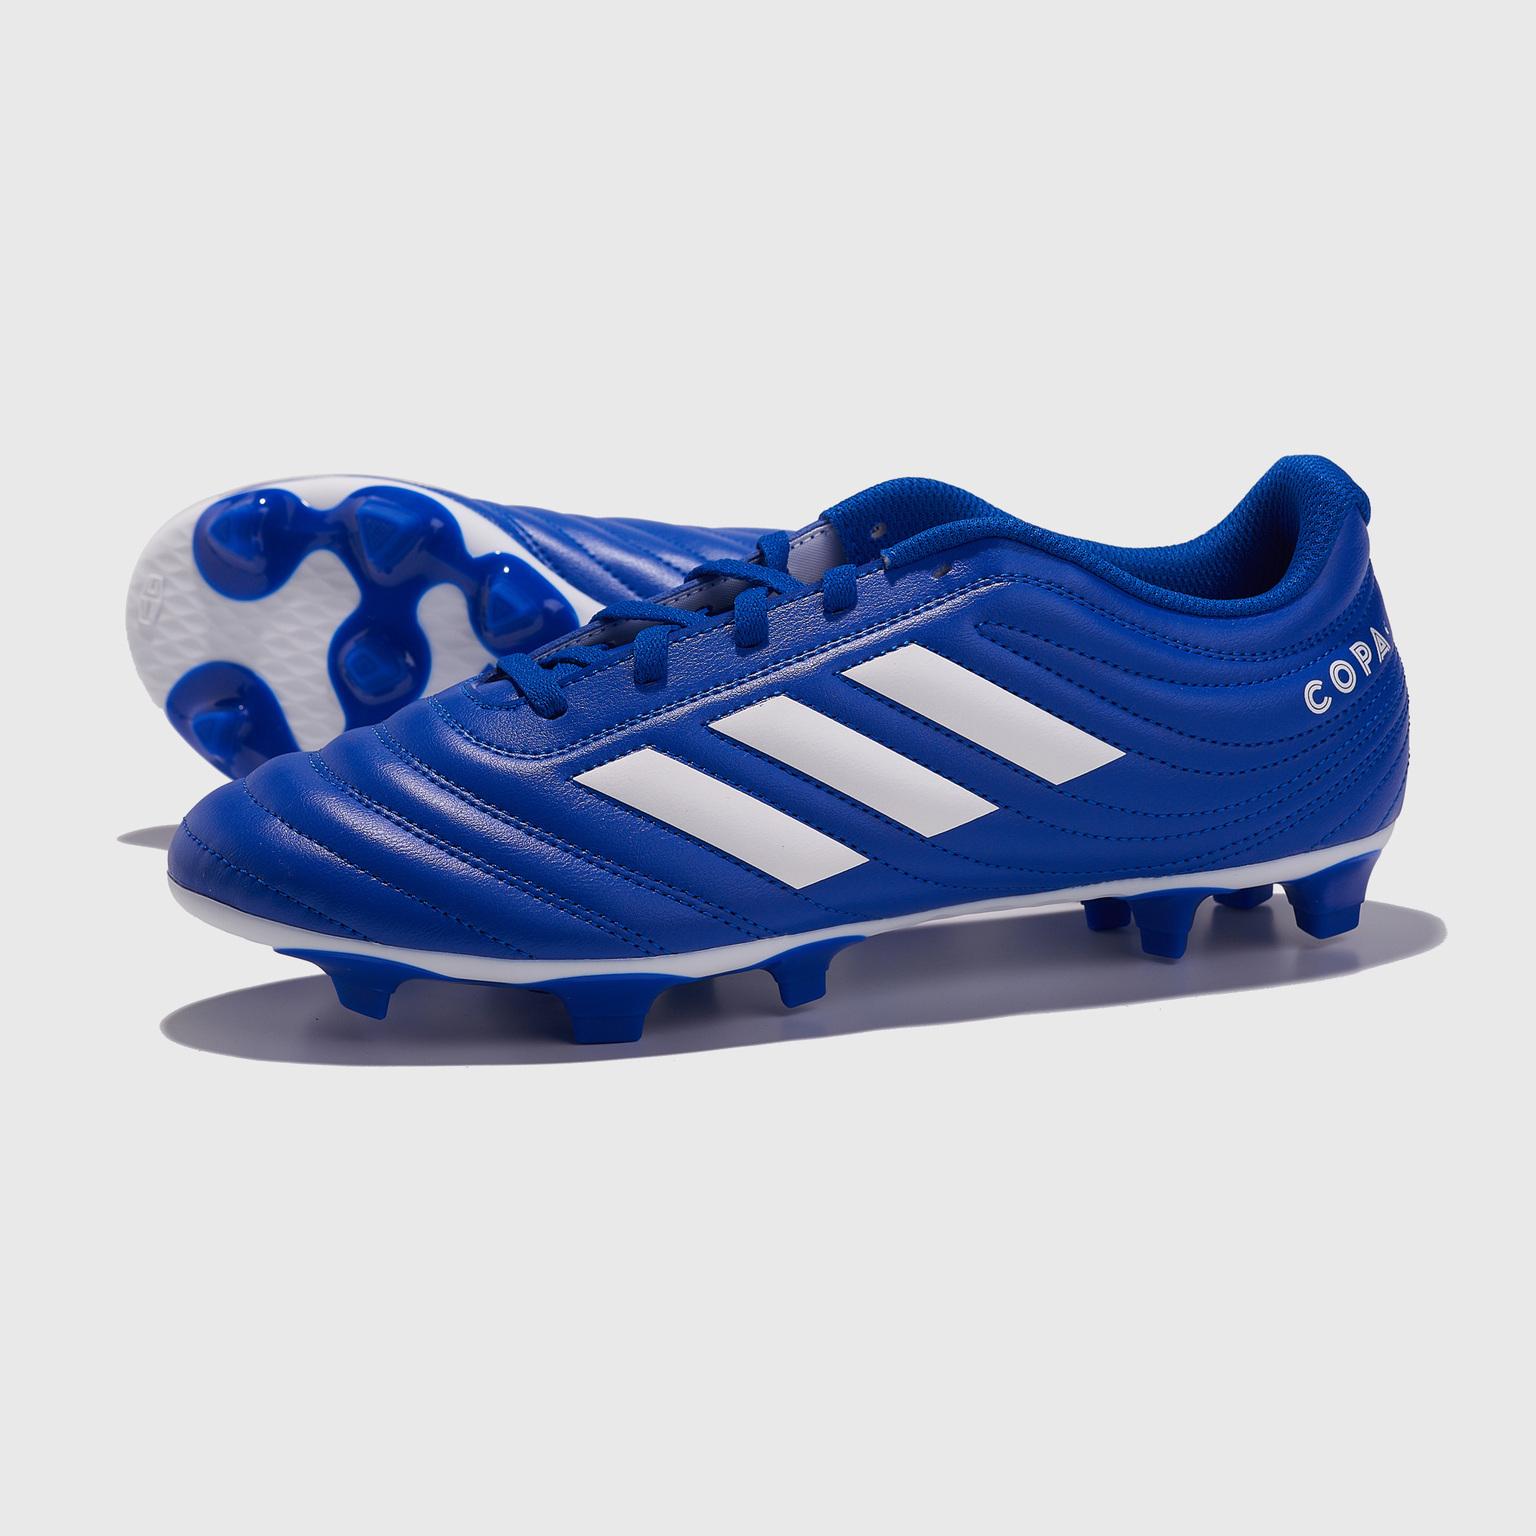 Бутсы Adidas Copa 20.4 FG EH1485 бутсы детские adidas copa 20 3 fg ef1913